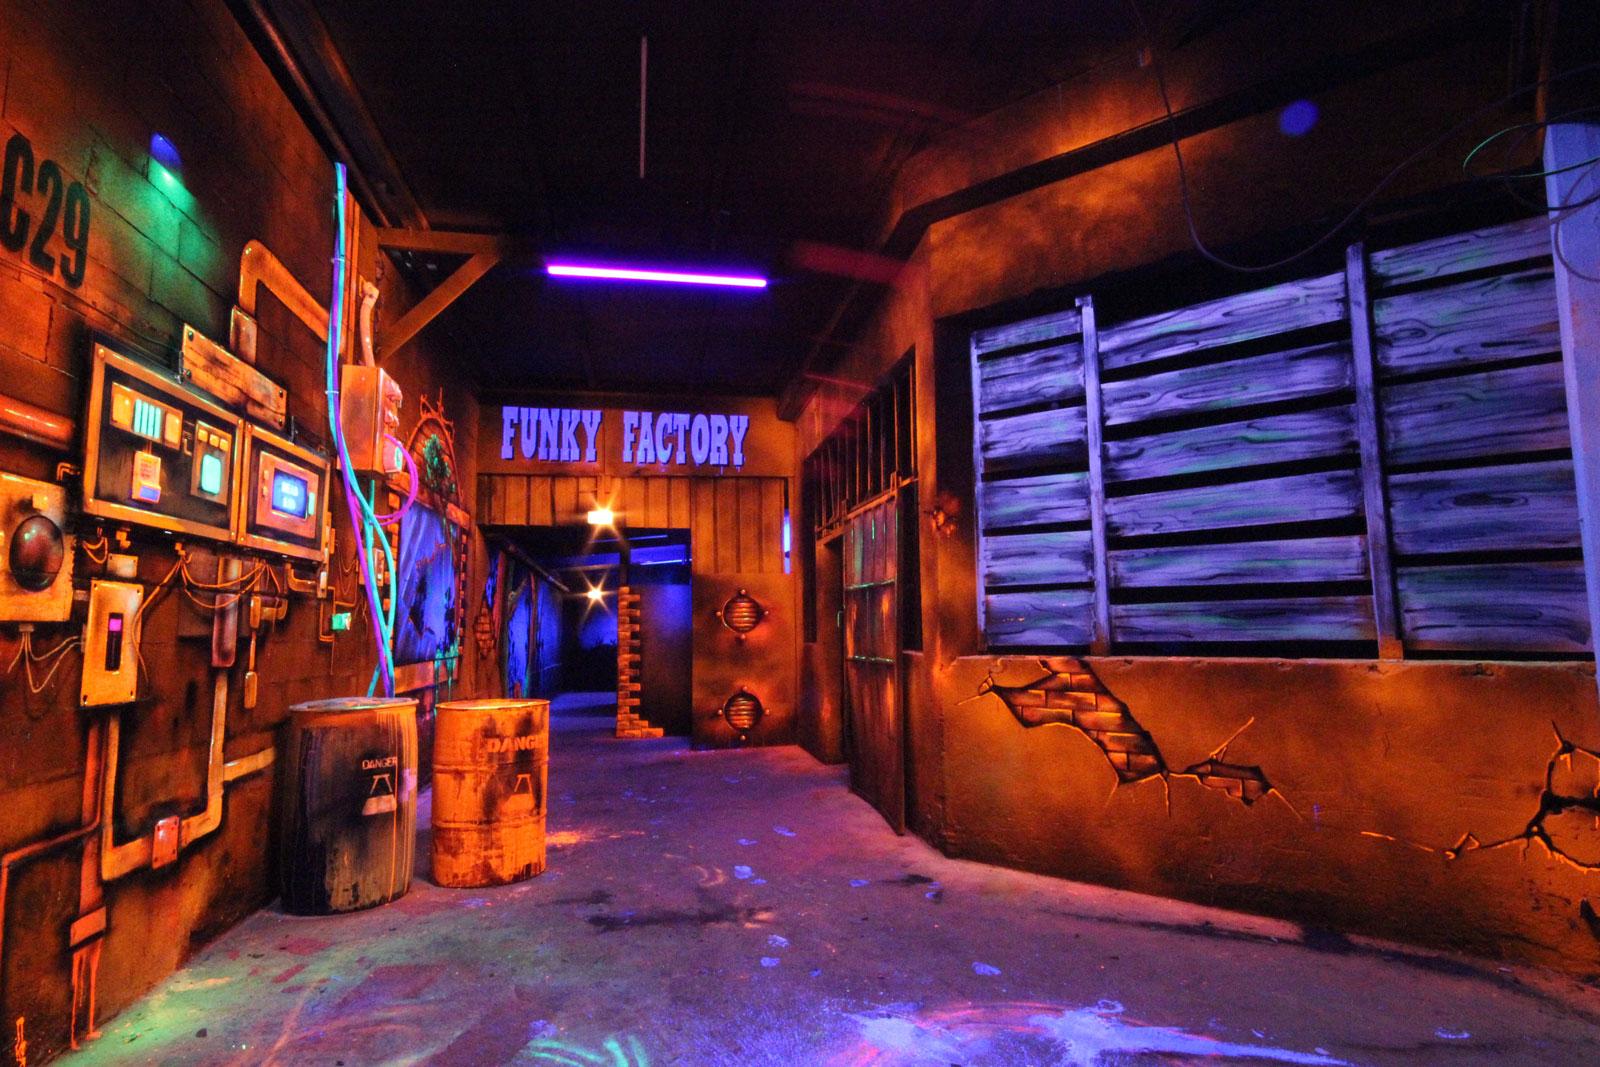 La salle de Laser Game de la Funky Factory - image 1